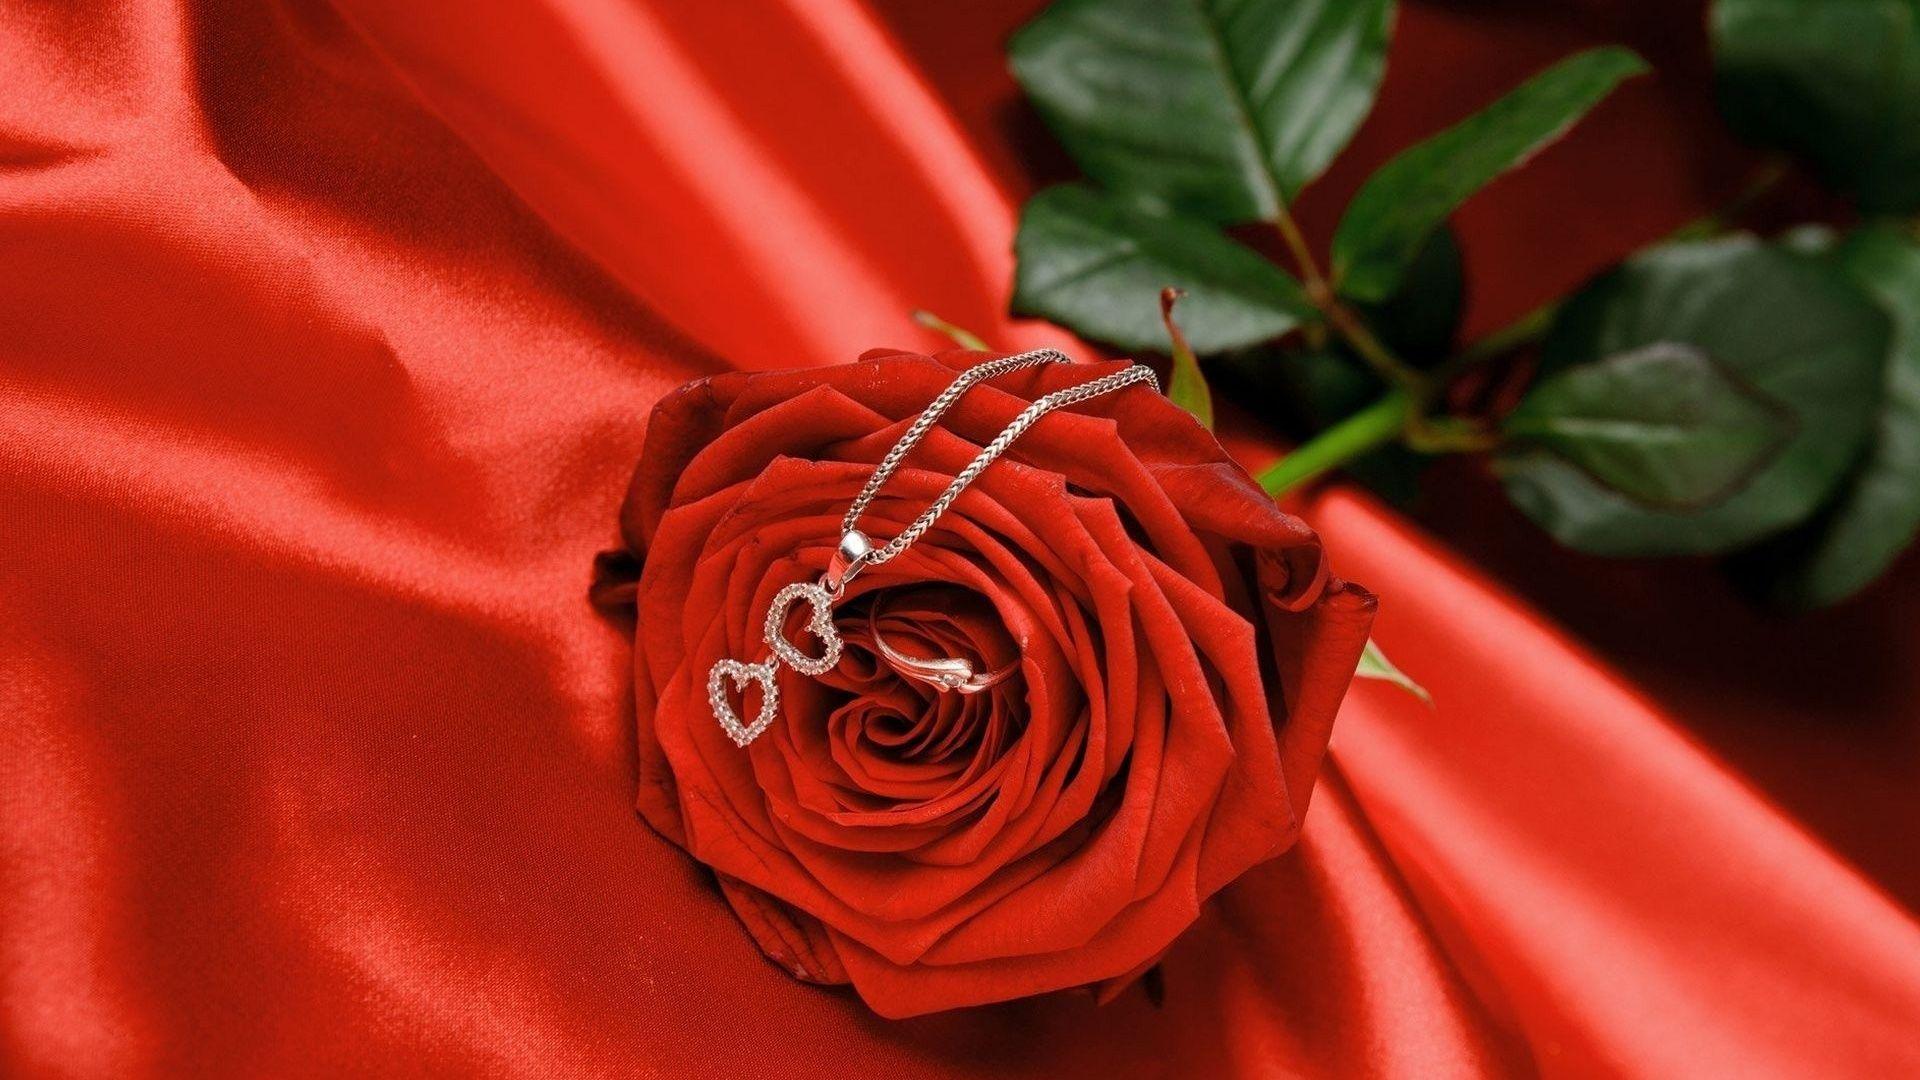 Love Rose Hd Wallpapers Hot Hd Wallpapers Blumen Rosen